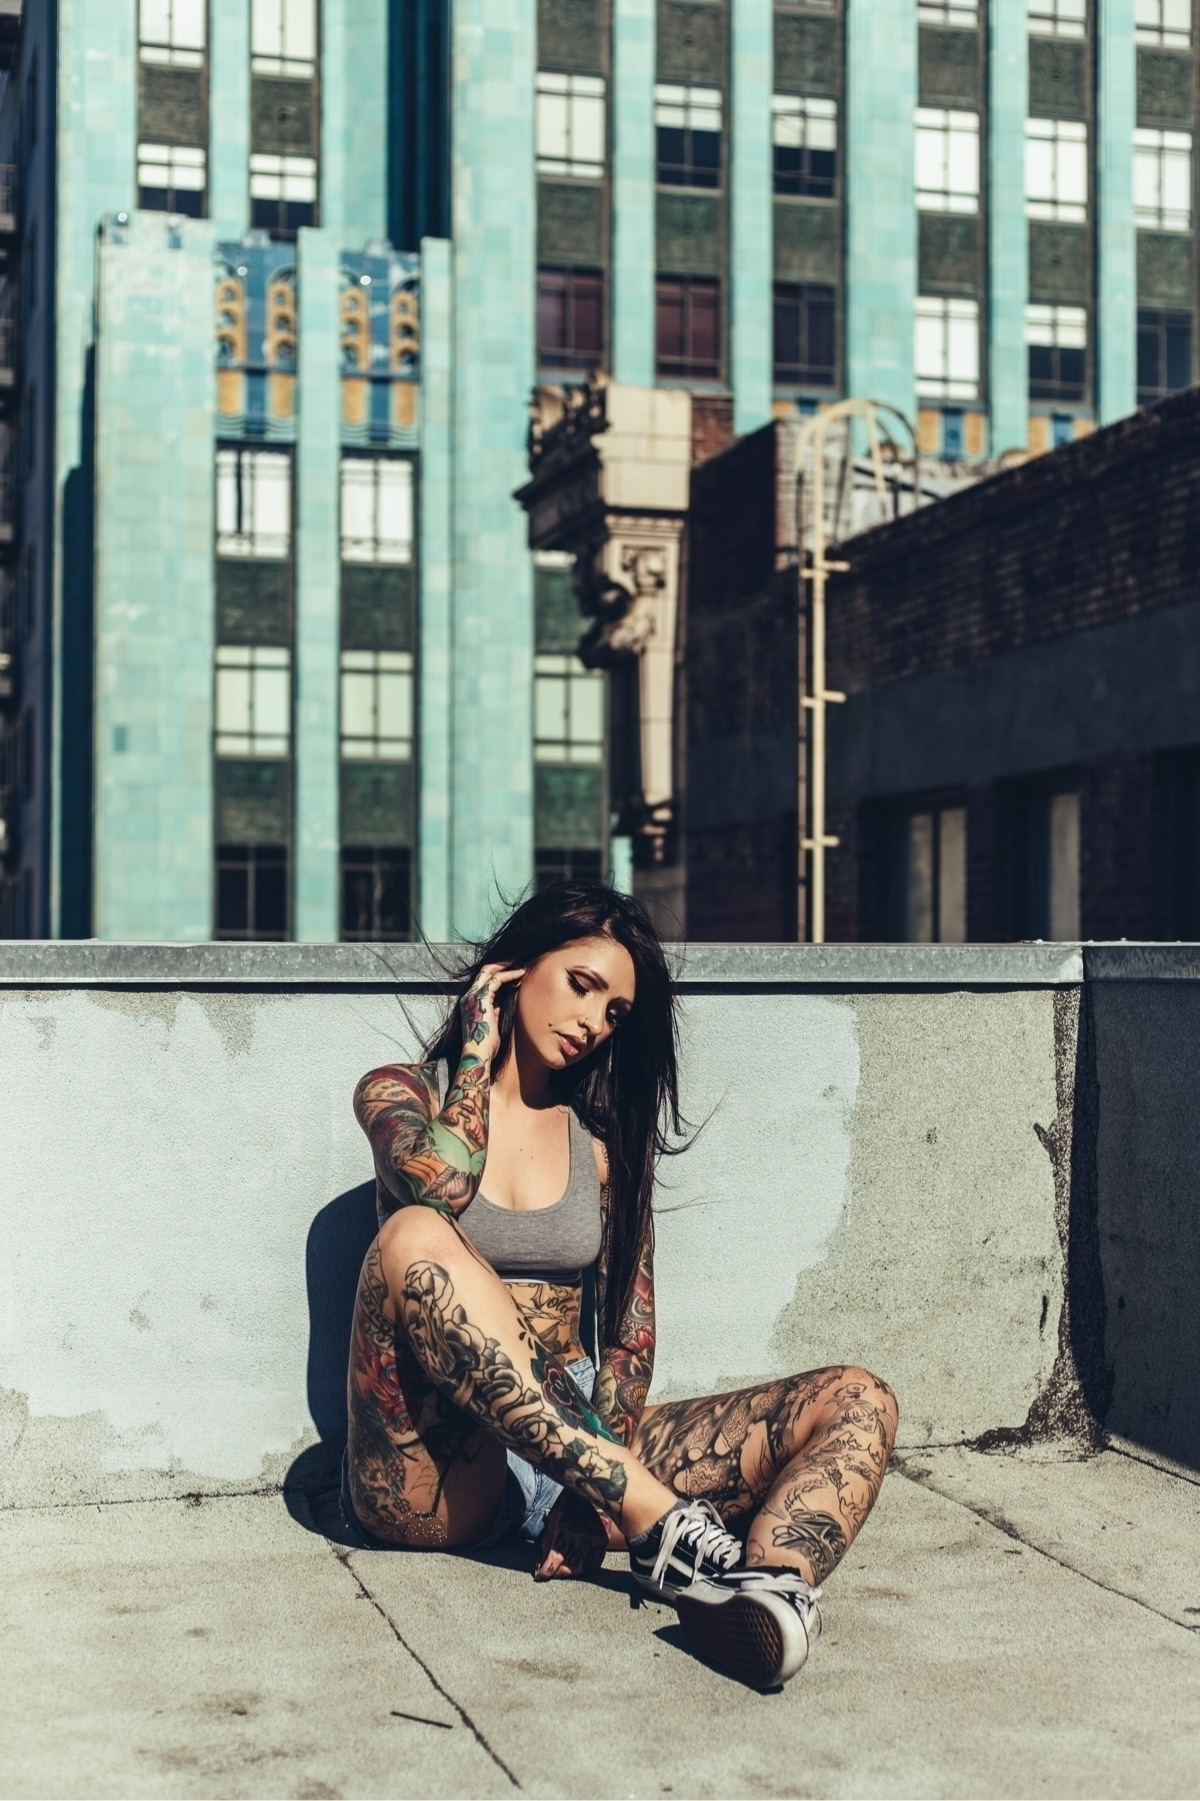 Love cost sanity Model Angela M - ladybaguette | ello